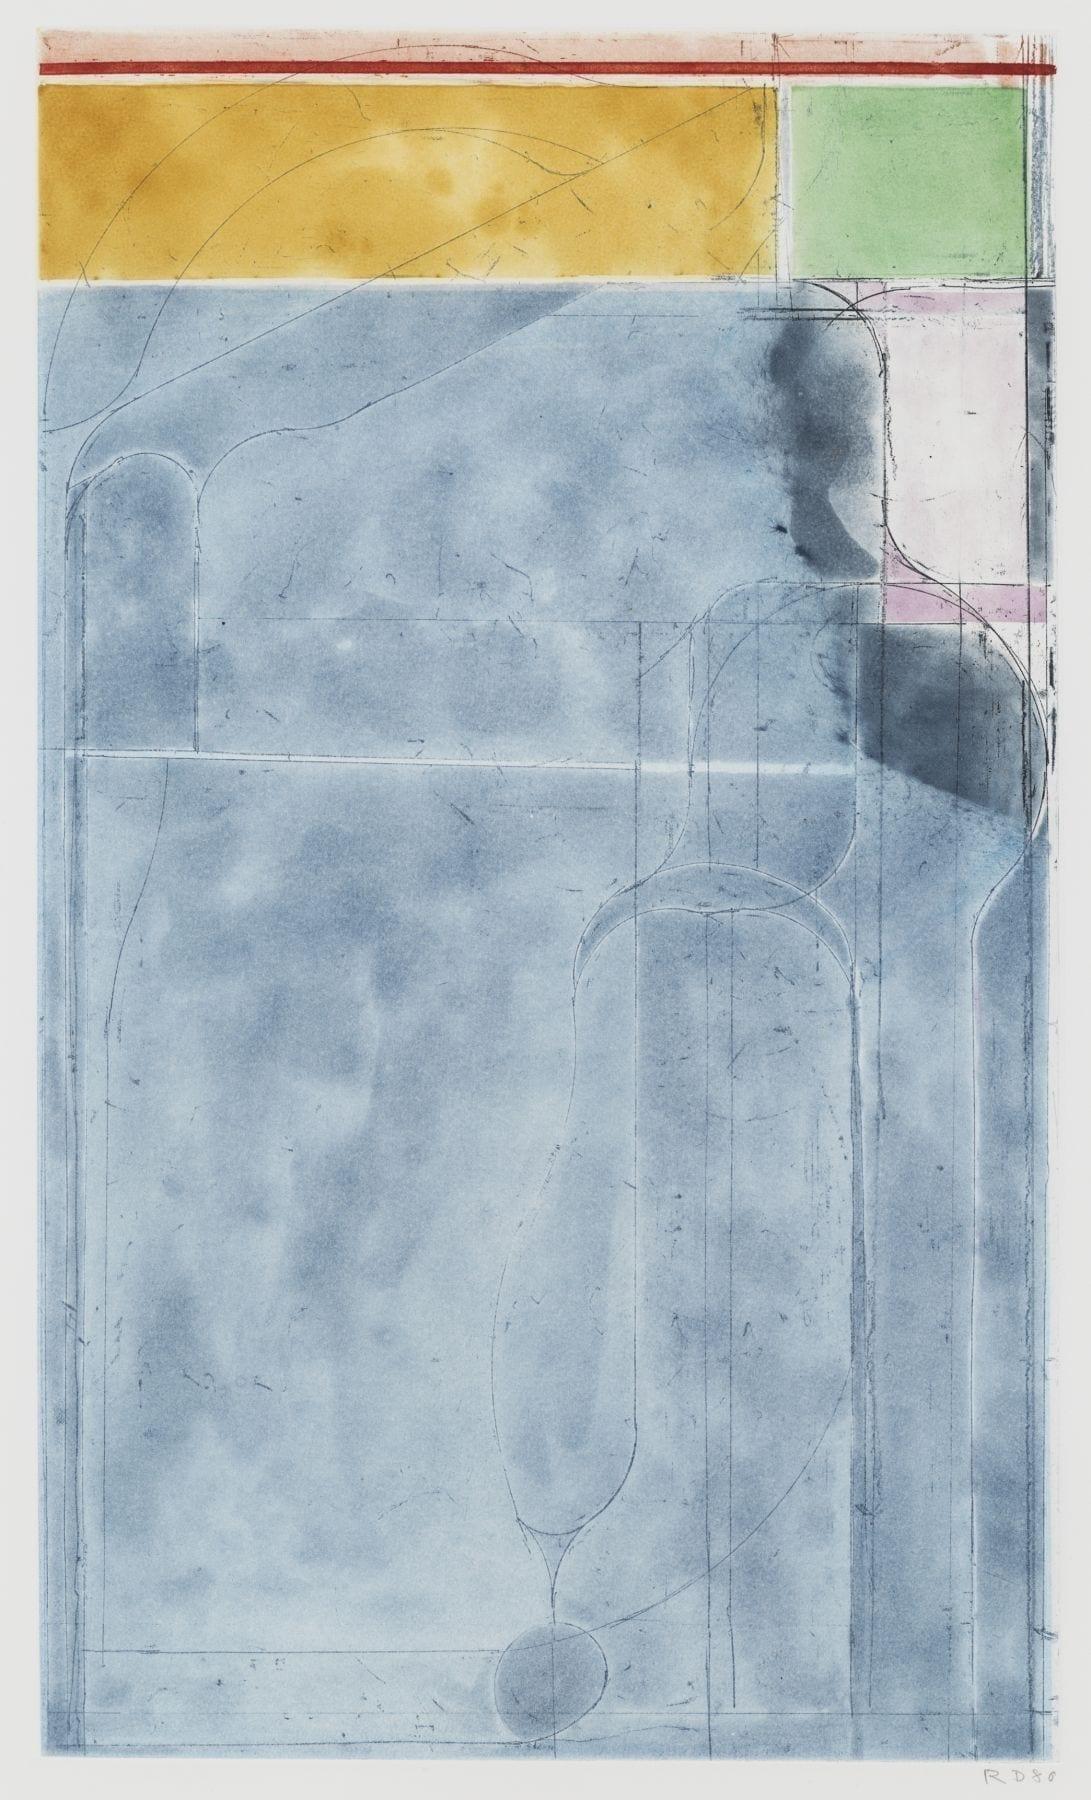 Richard Diebenkorn, Large Light Blue, 1980, Spibite aquatint with softground